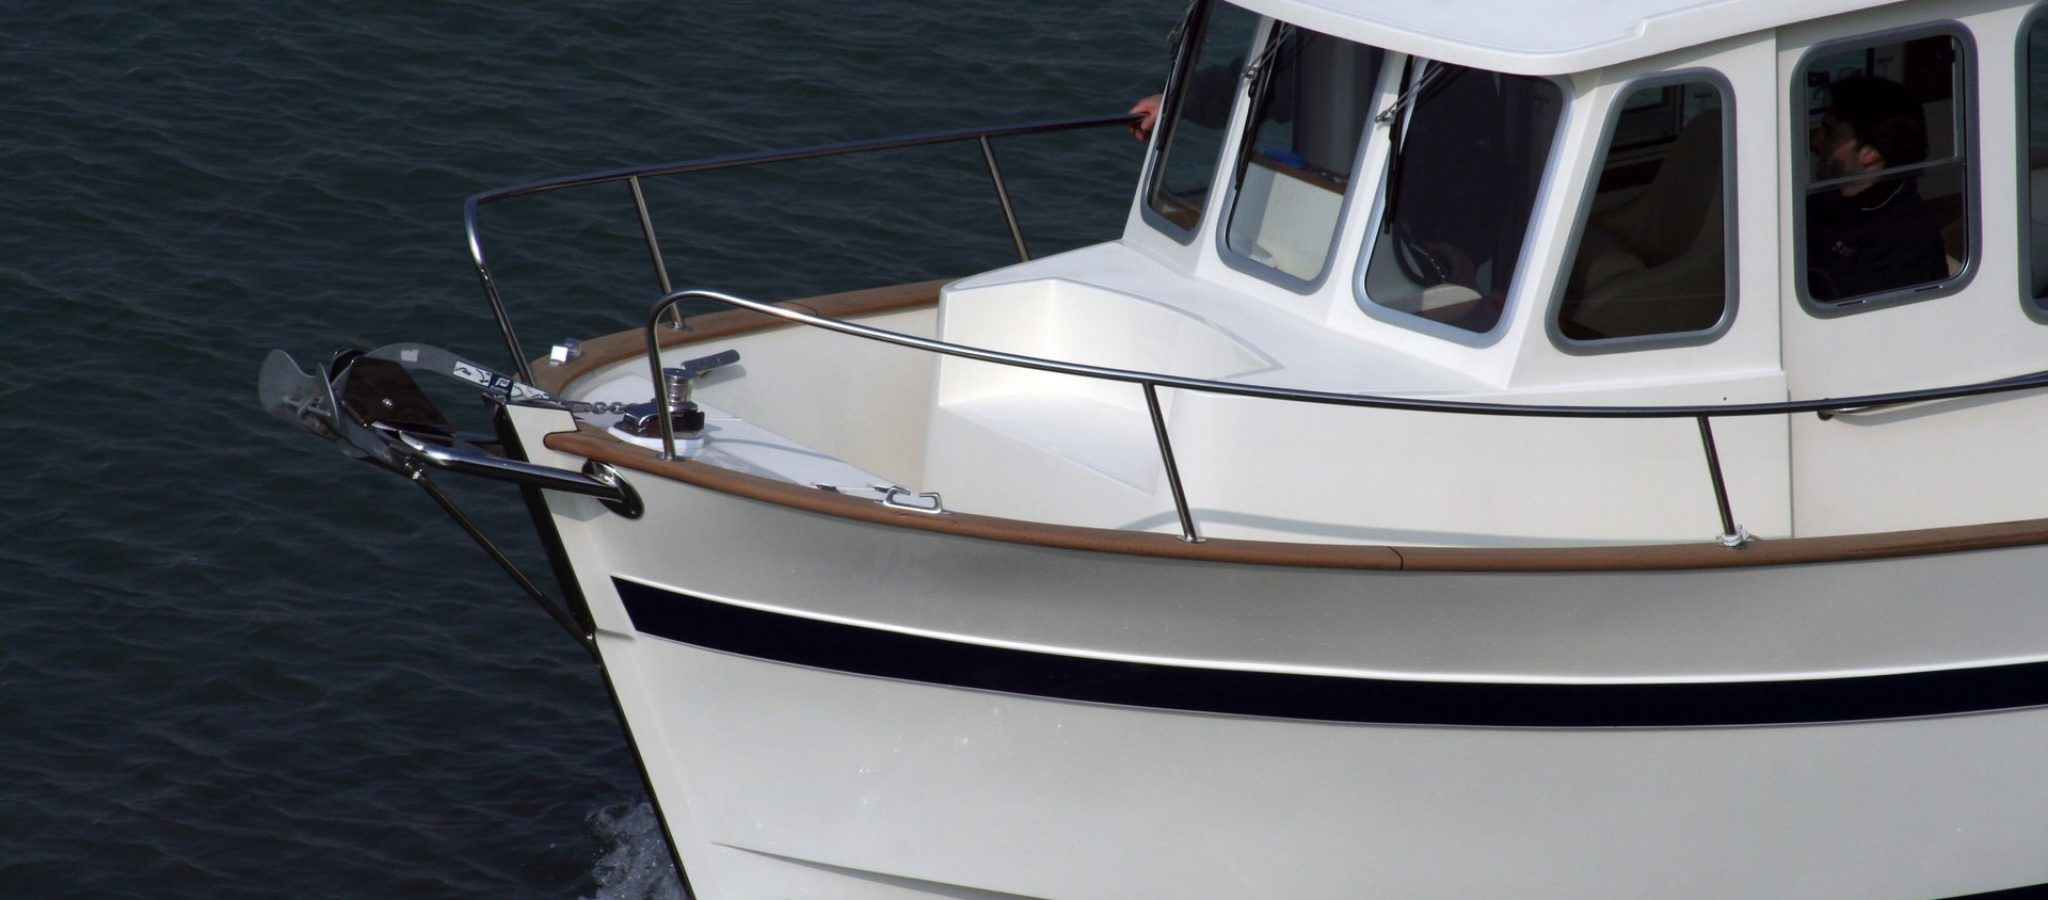 Rhéa-marine-730timonier (4)web (1)